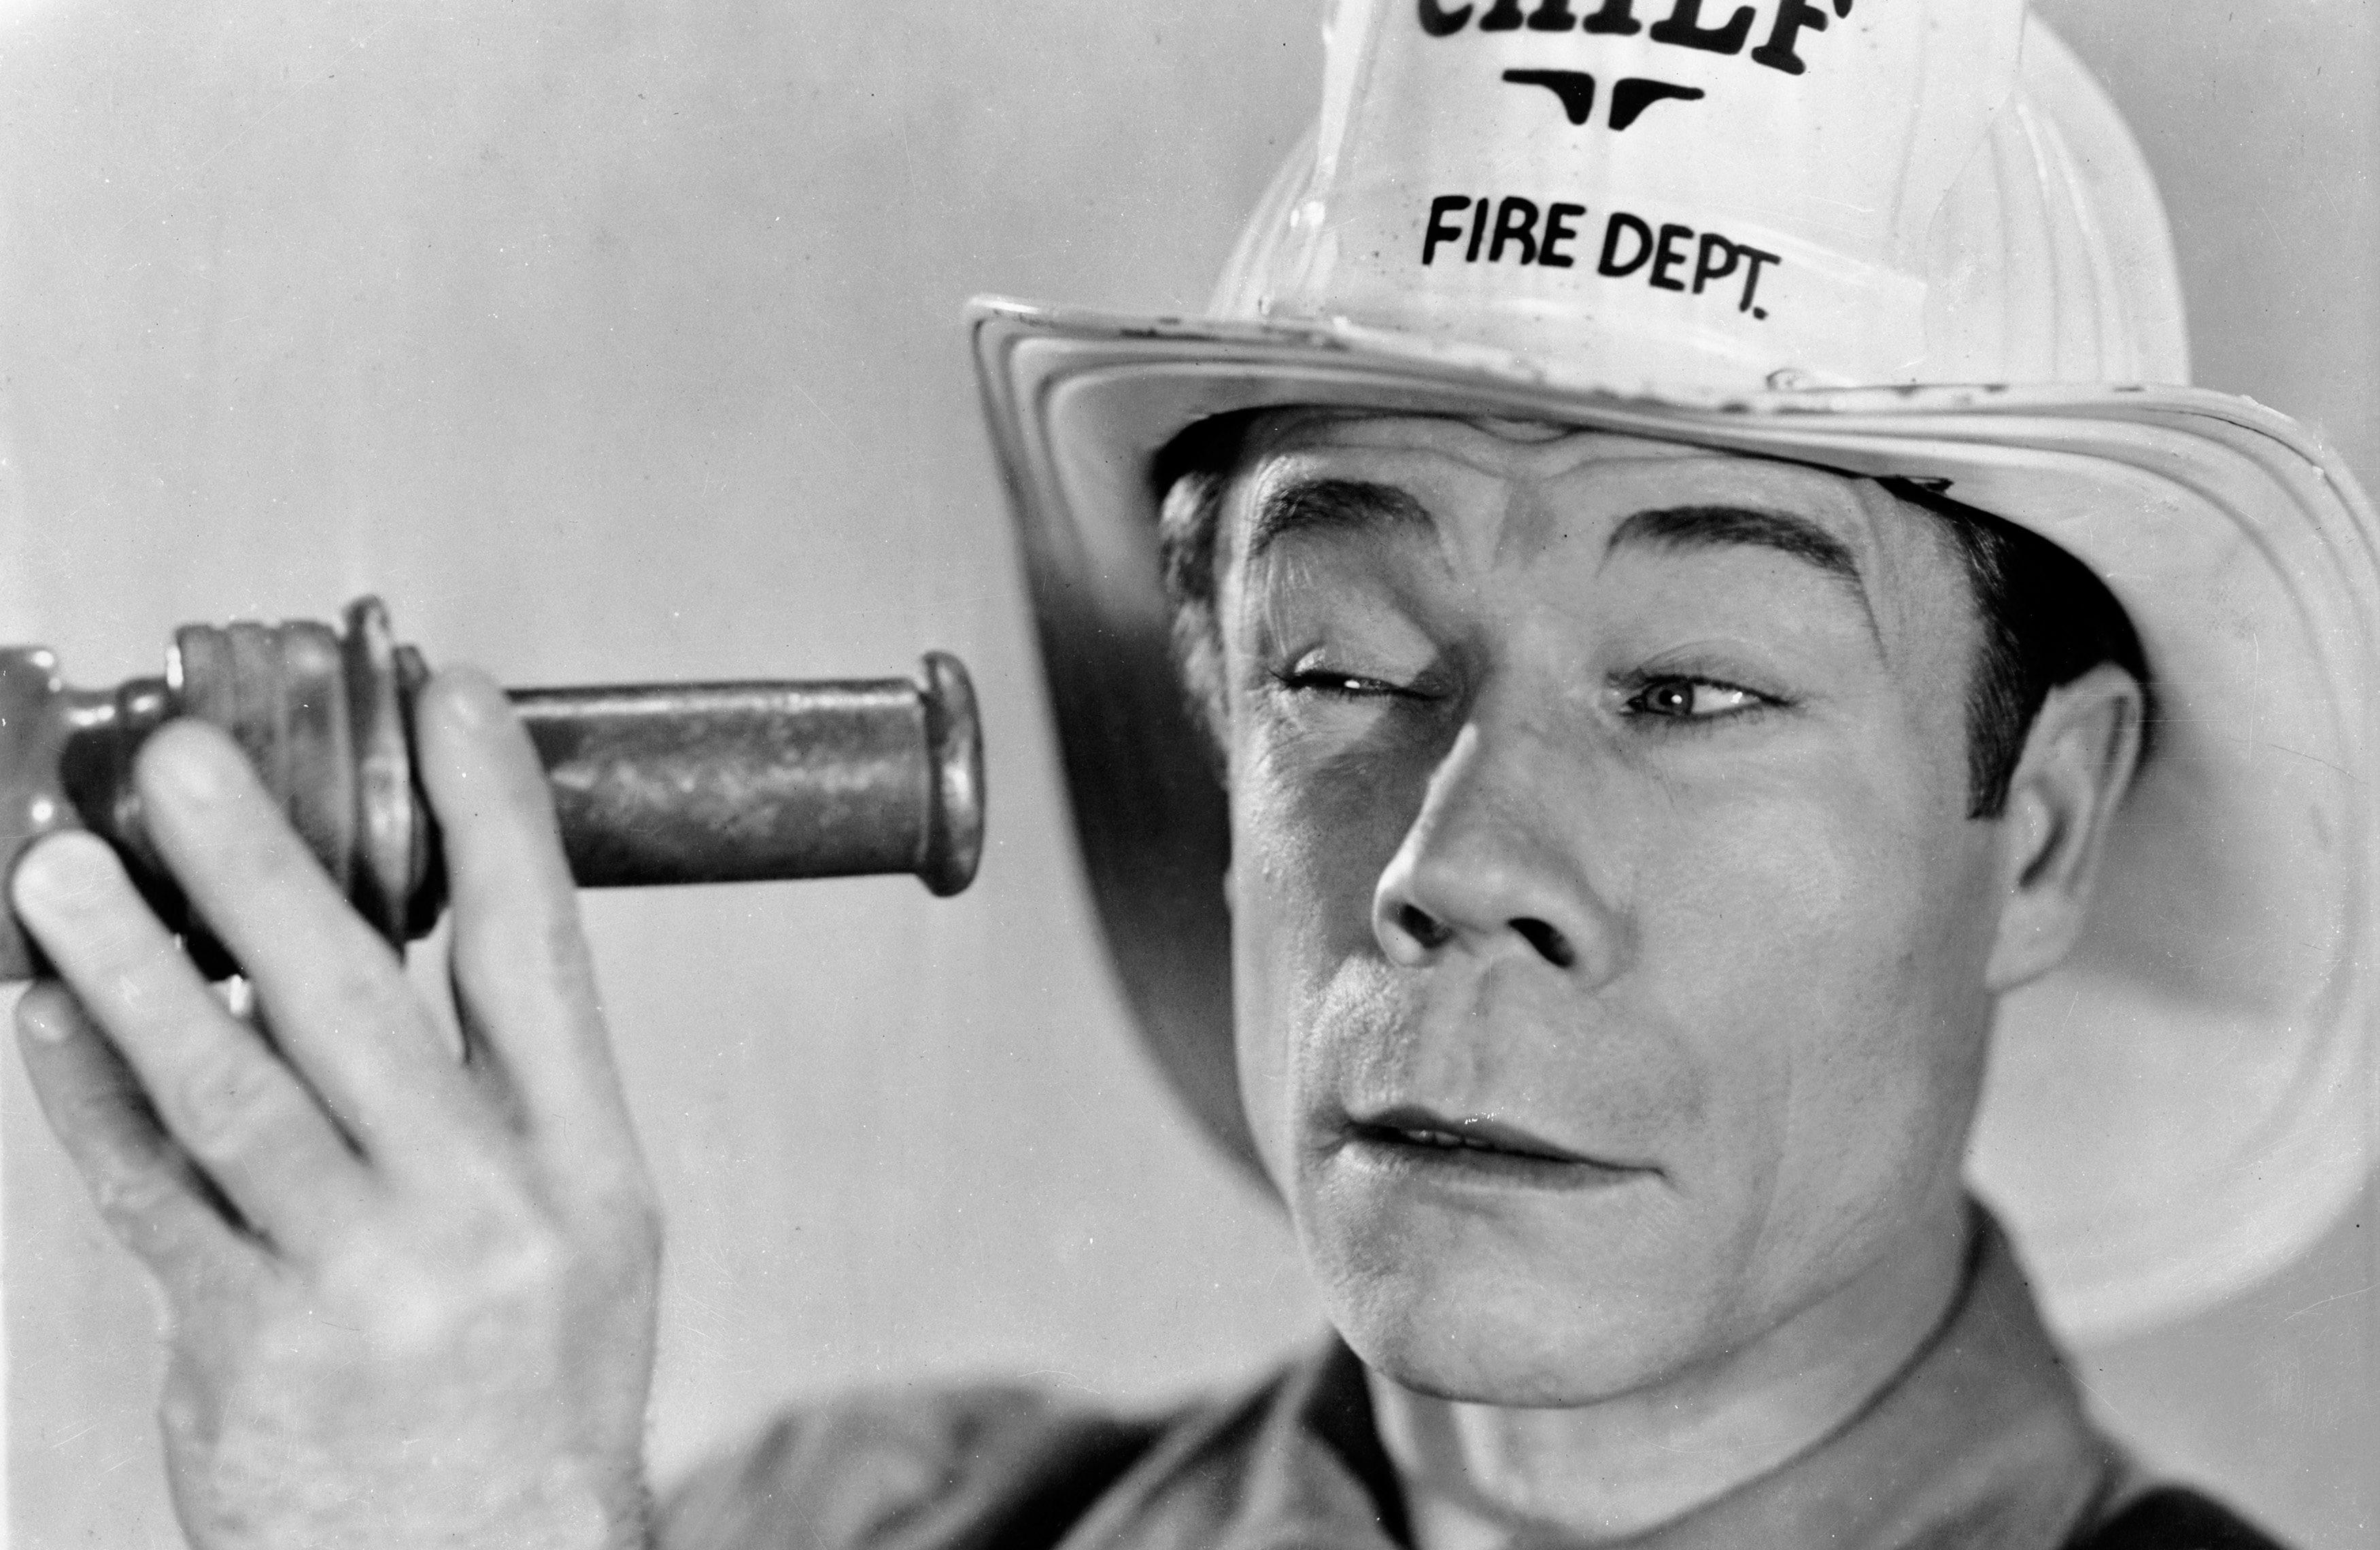 Fireman Save My Child